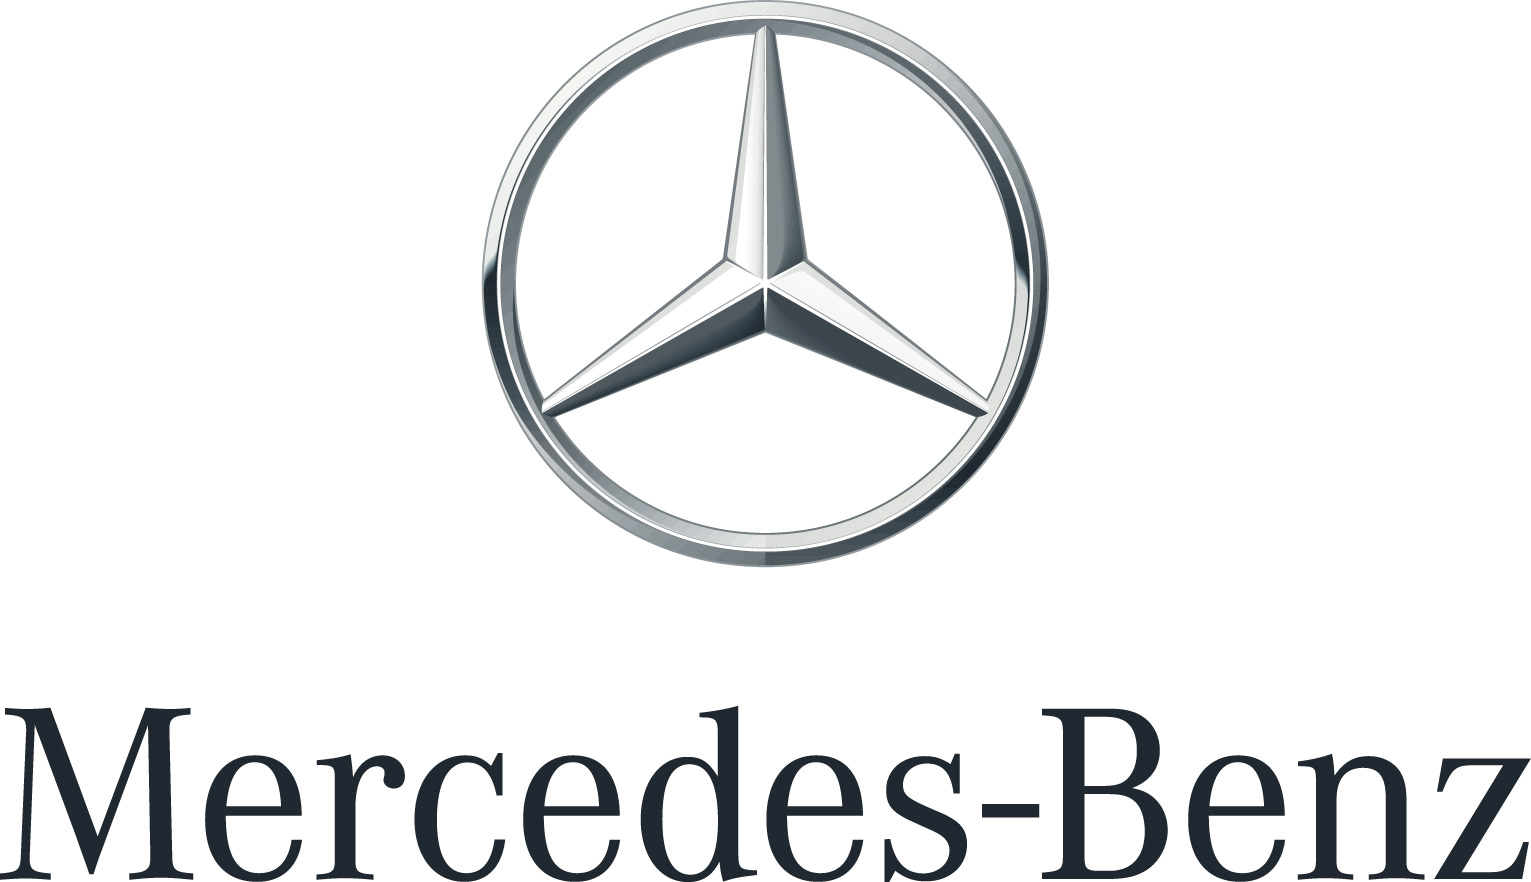 8 Mercedes-Benz Logo Vector Images